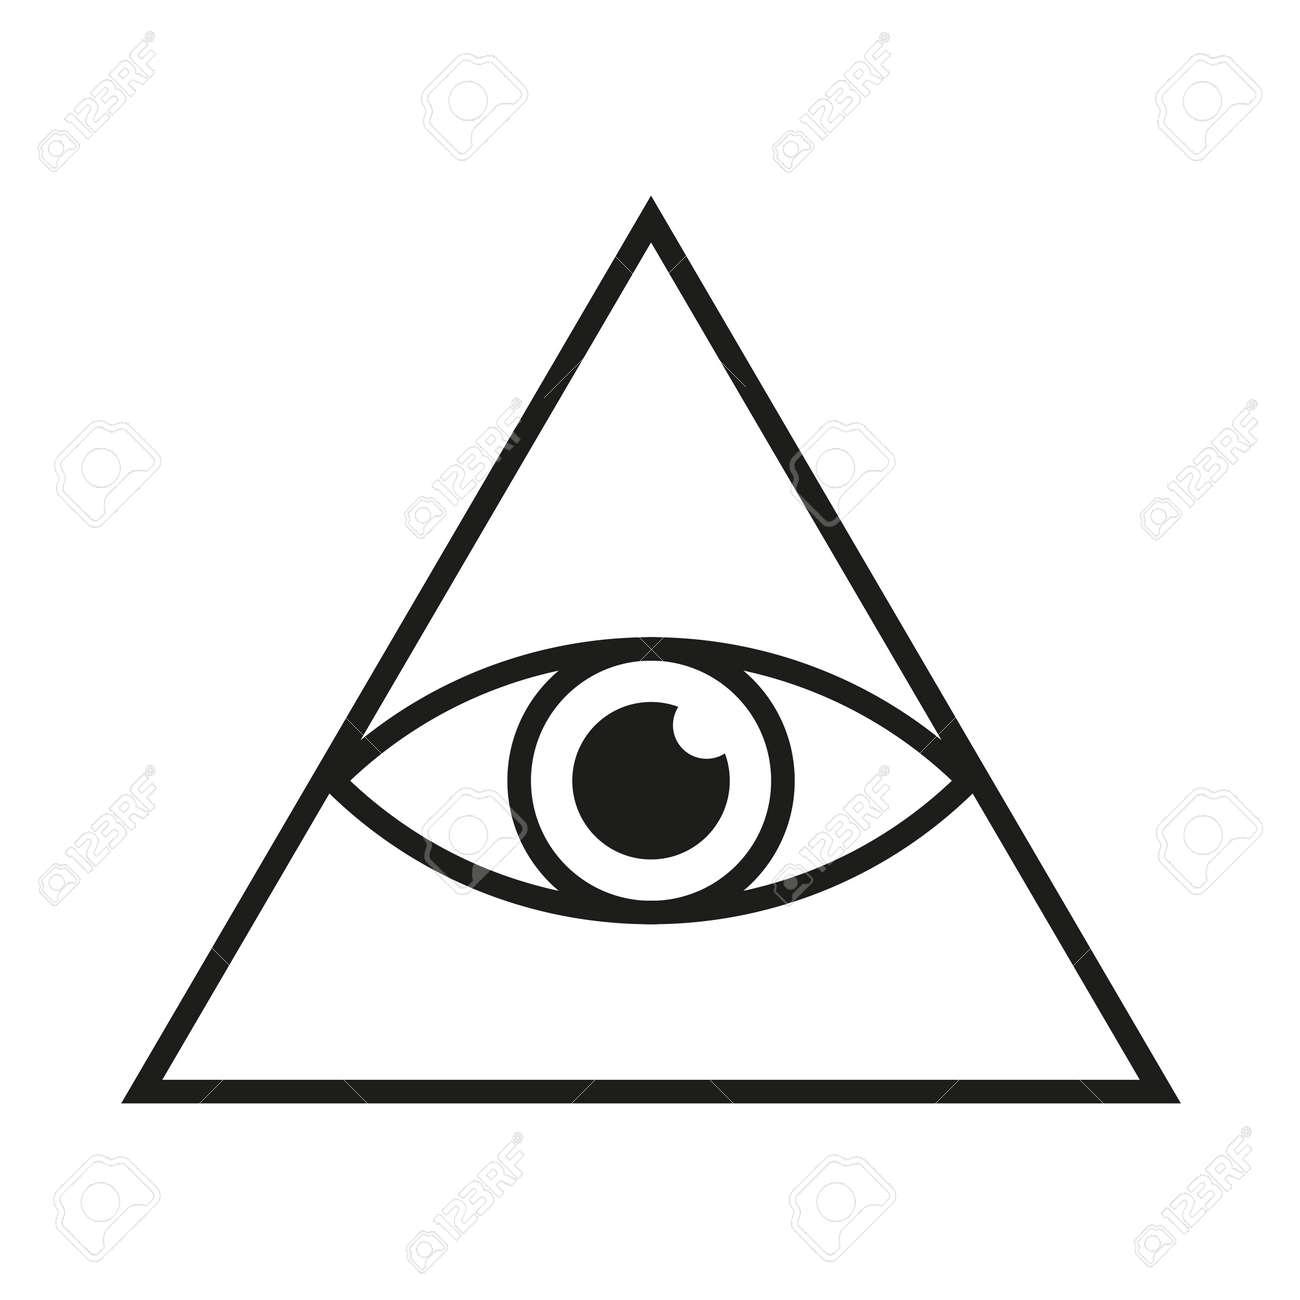 Eye in triangle simple minimalistic symbol. All seeing Illuminati eye pyramid isolated vector illustration - 153195681